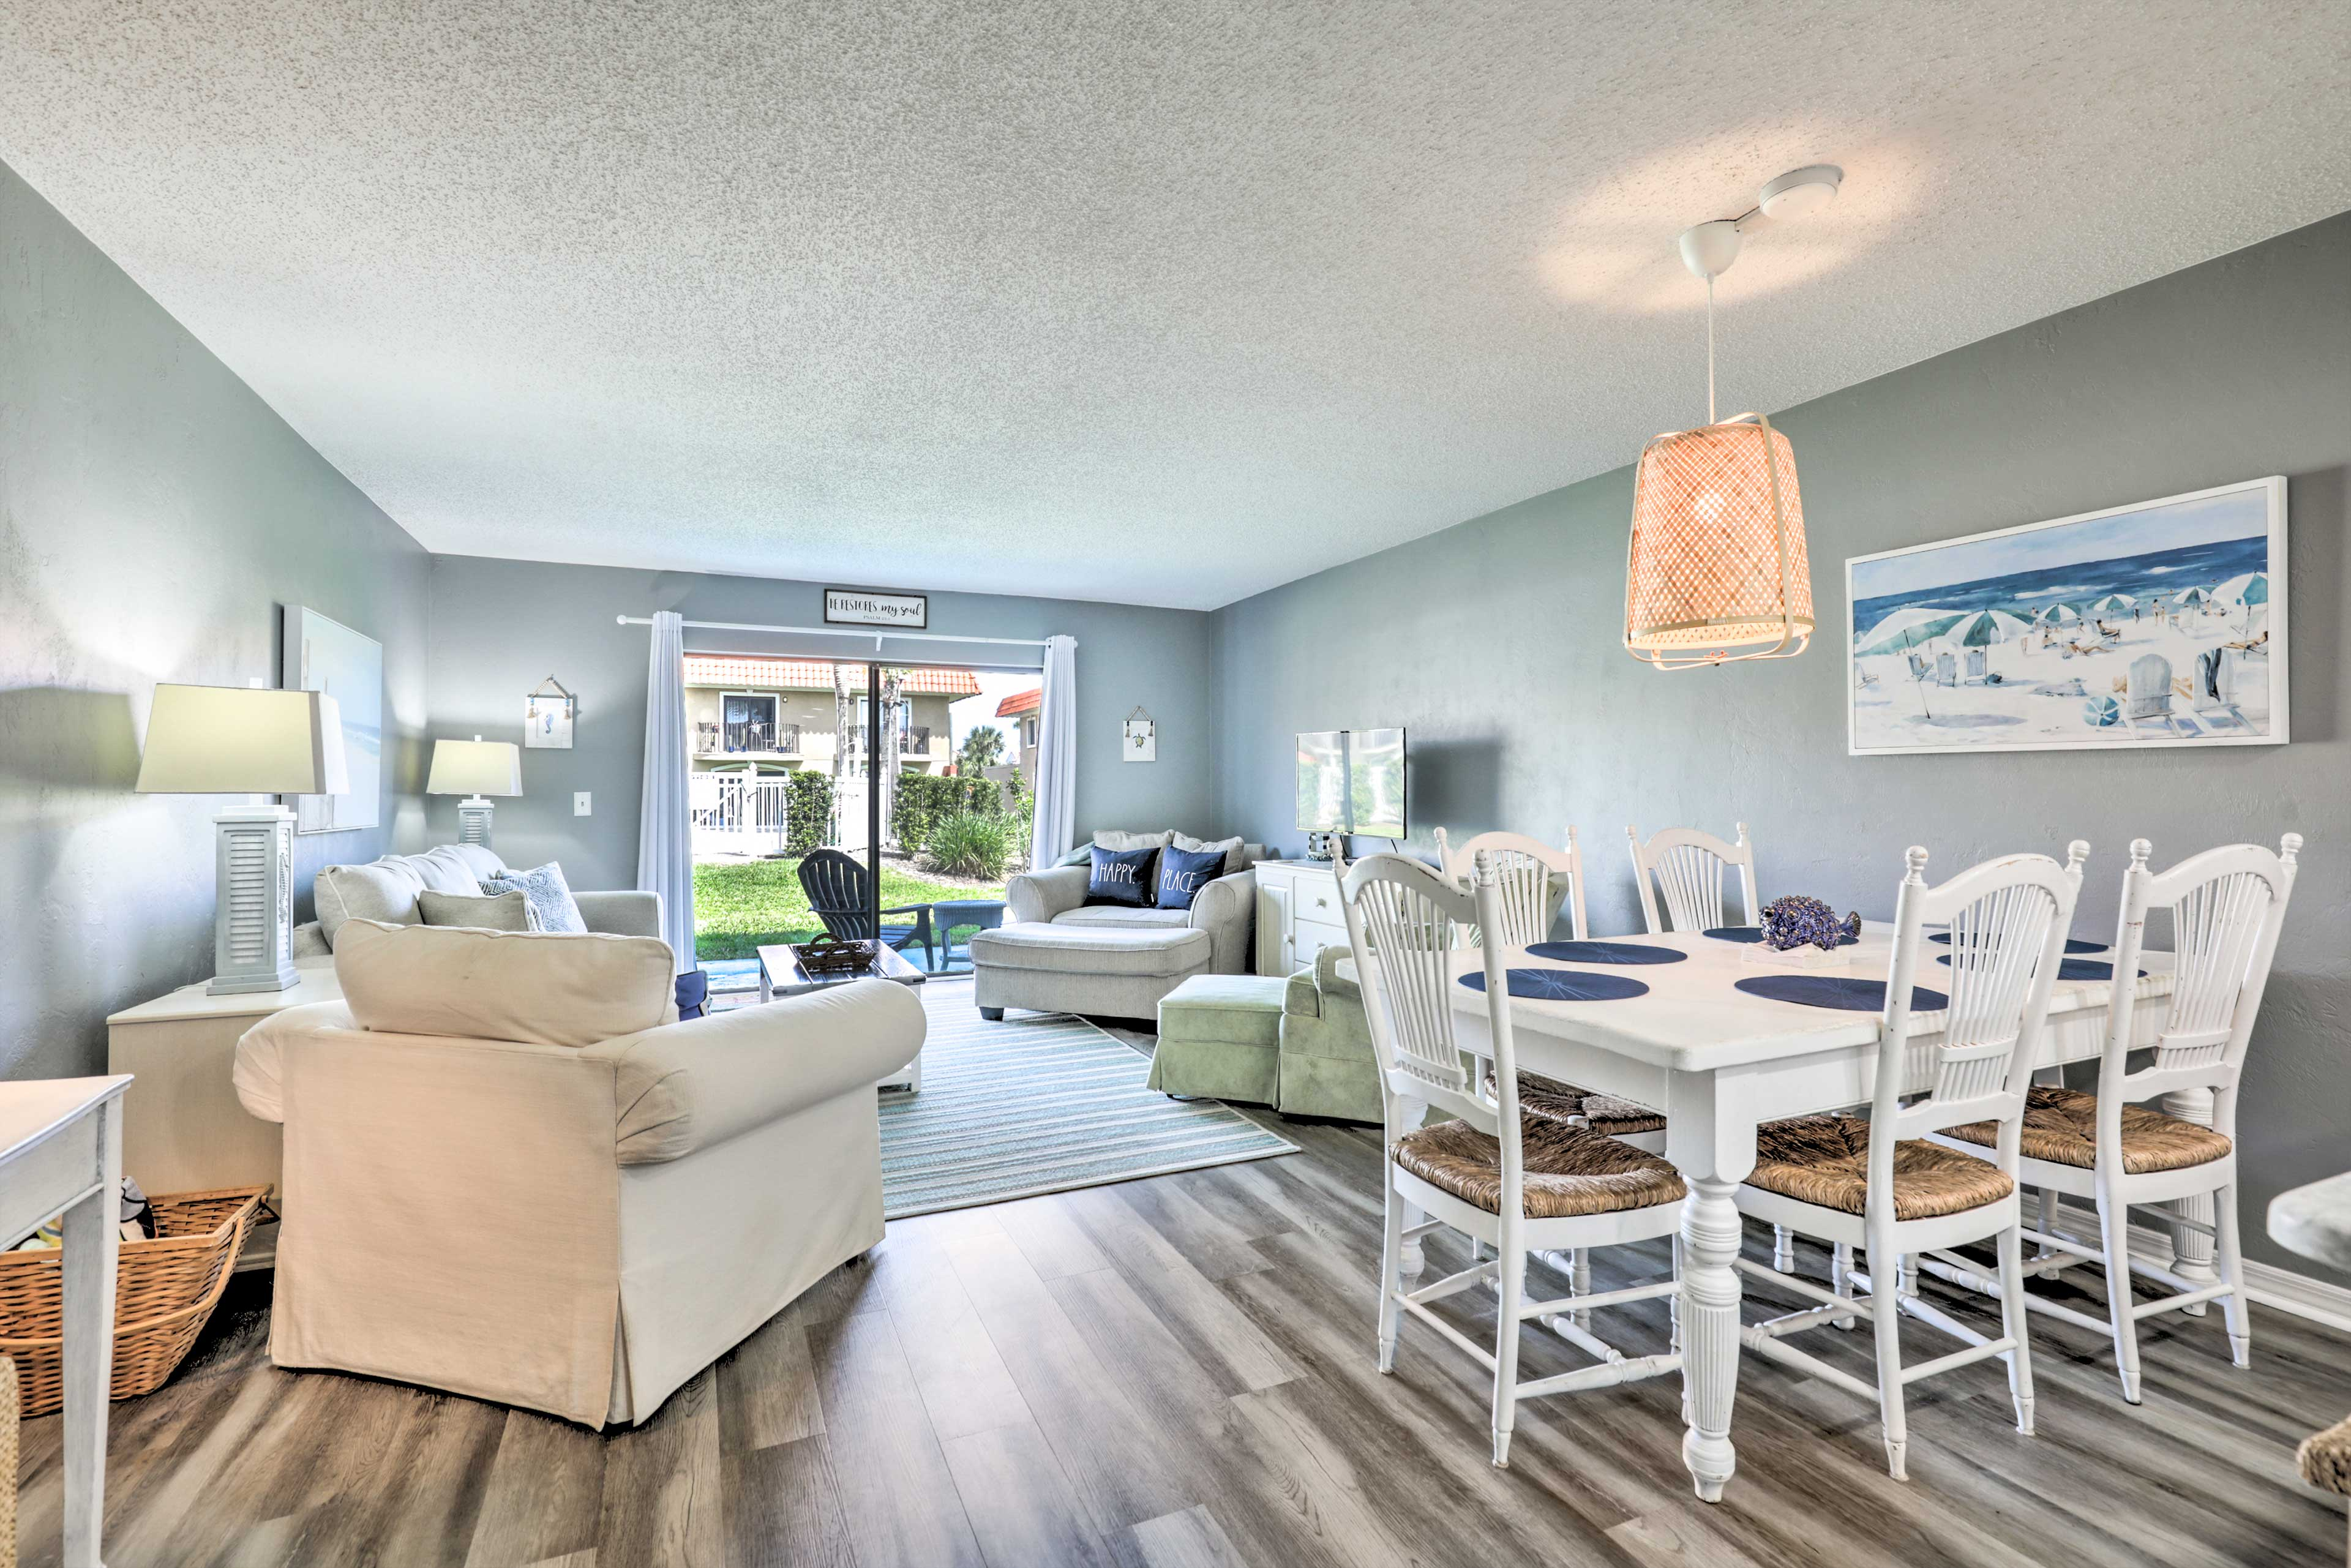 Natural light illuminates the spacious living area featuring ideal amenities.